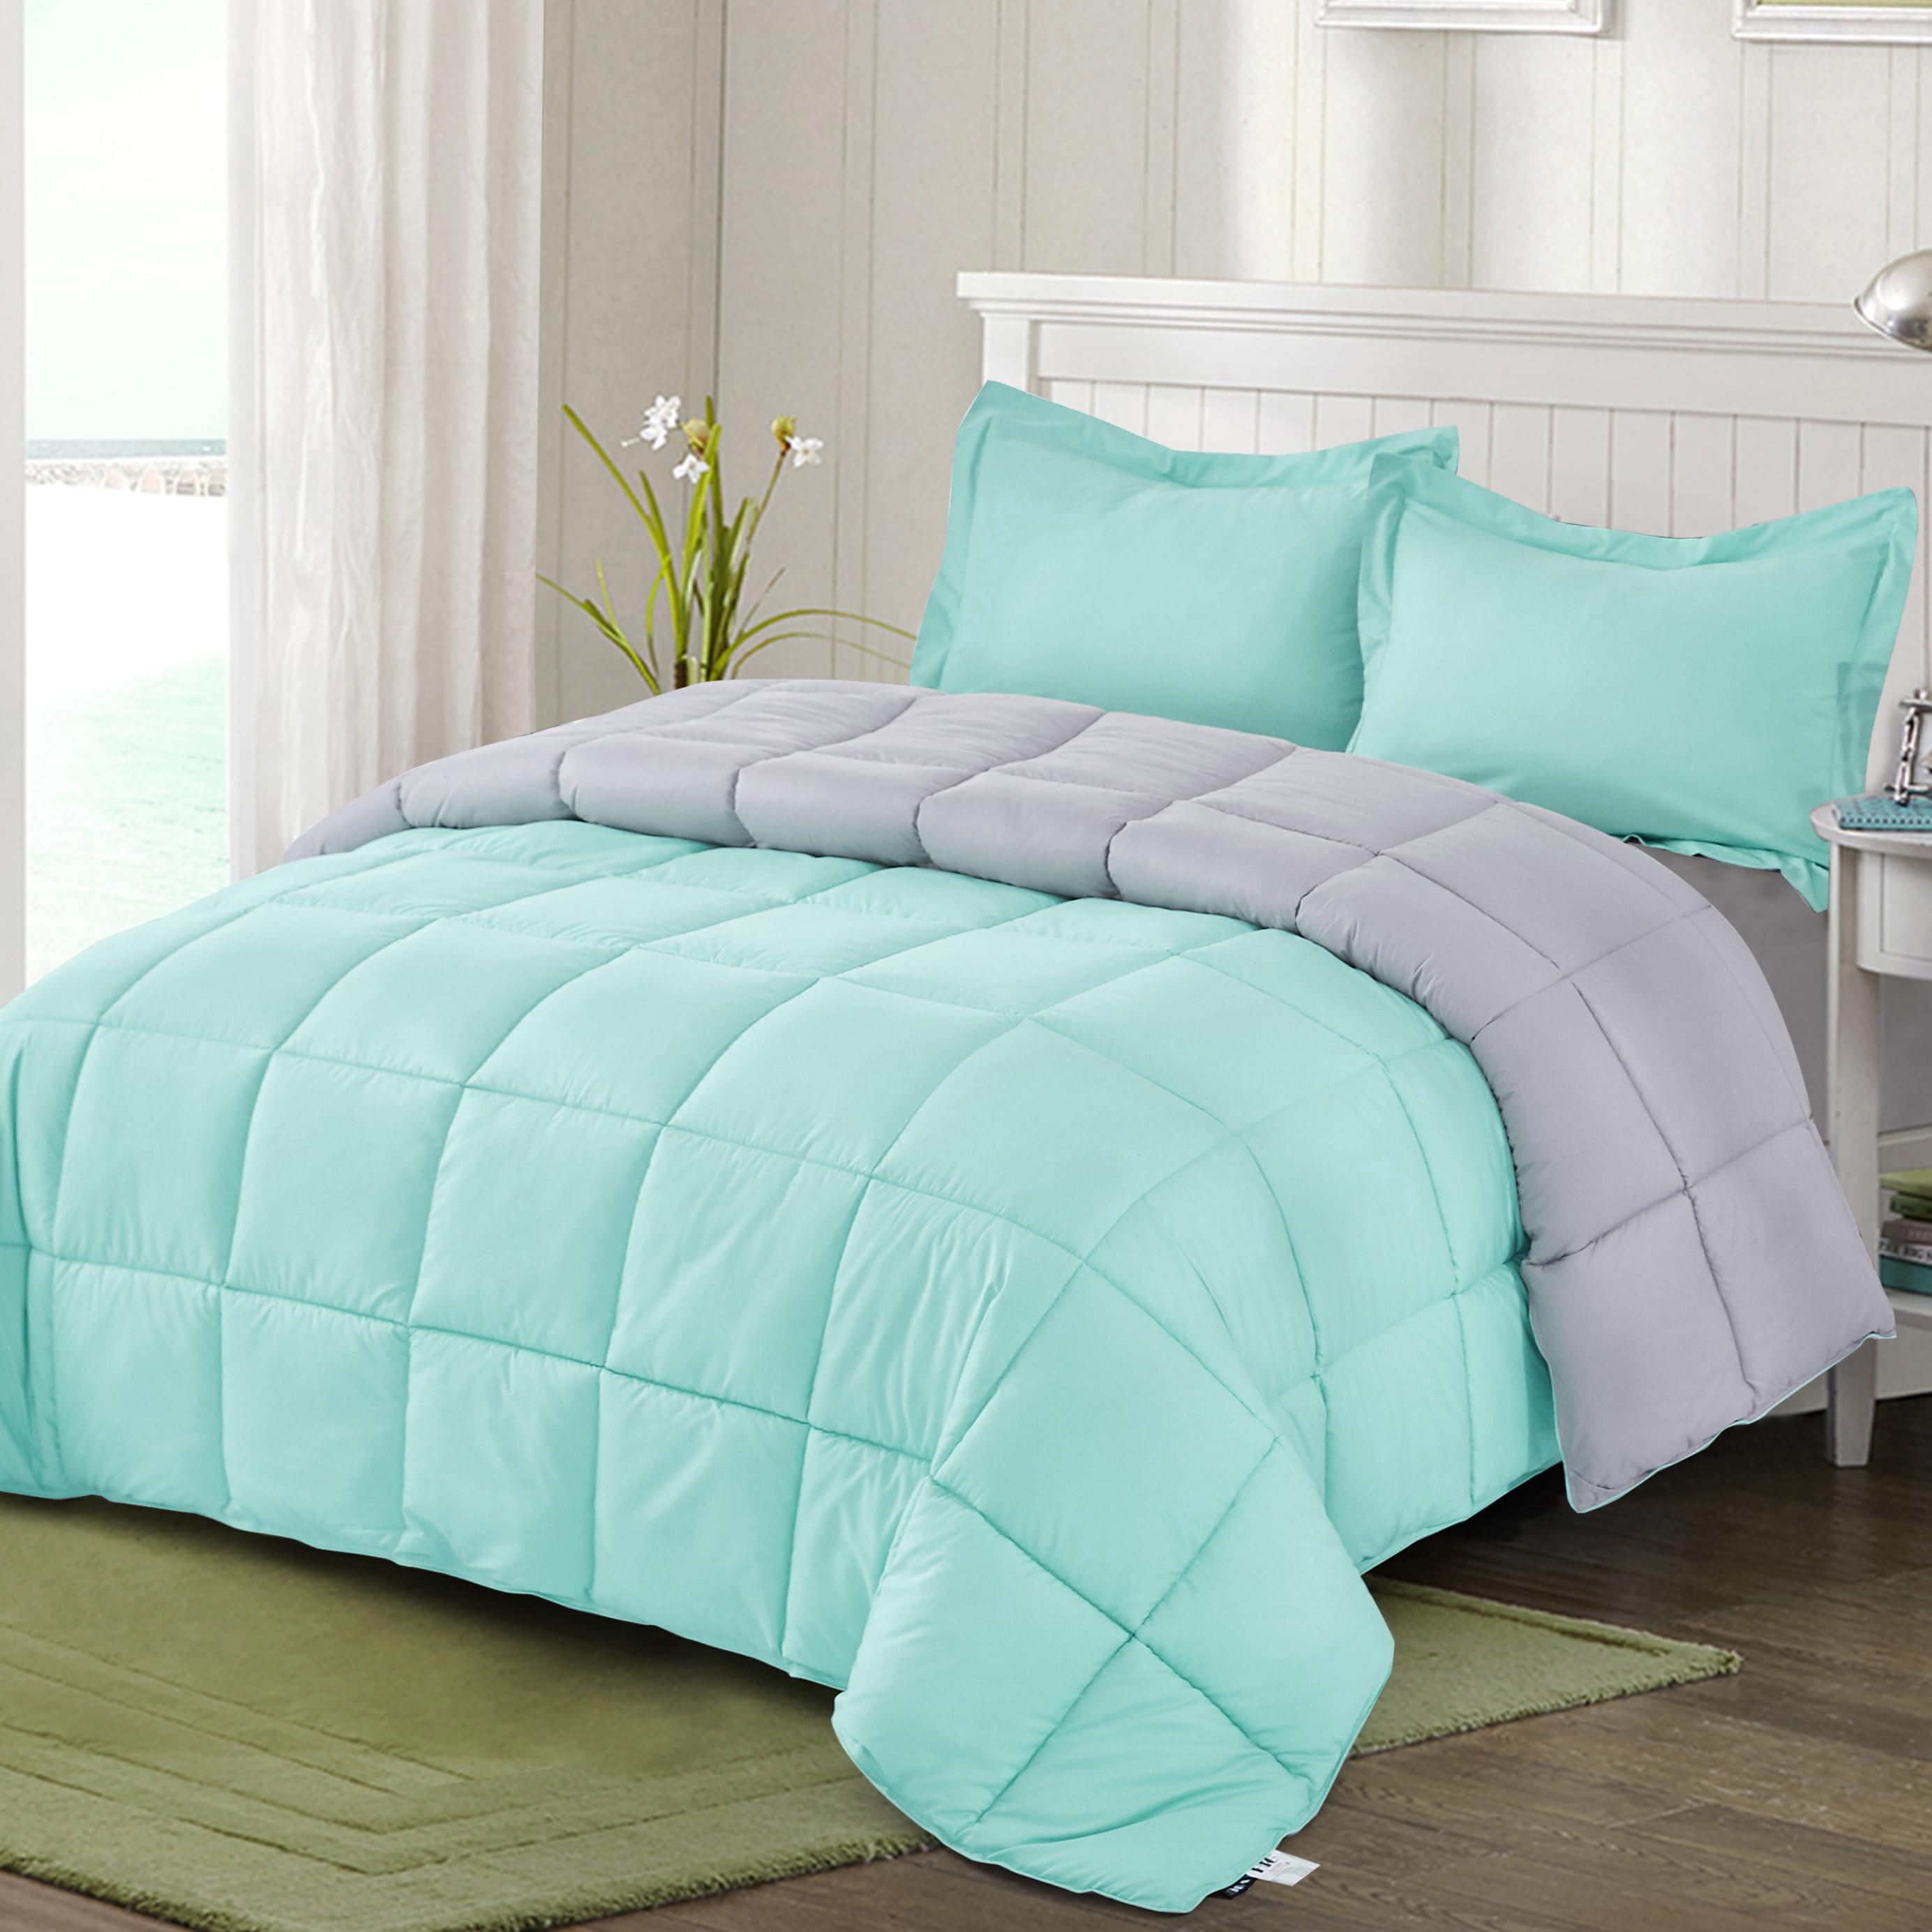 Hig Reversible Lightweight Comforter Set All Season Down